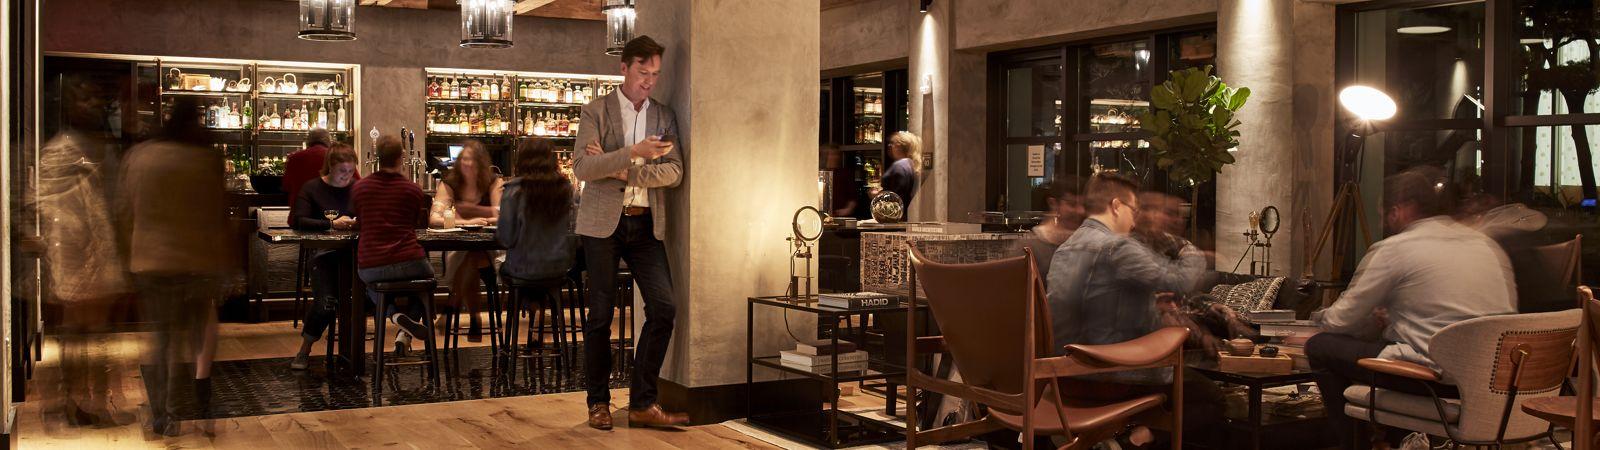 HotelKabuki_Lobby_Bar_Evening1_Hero_Lifestyle